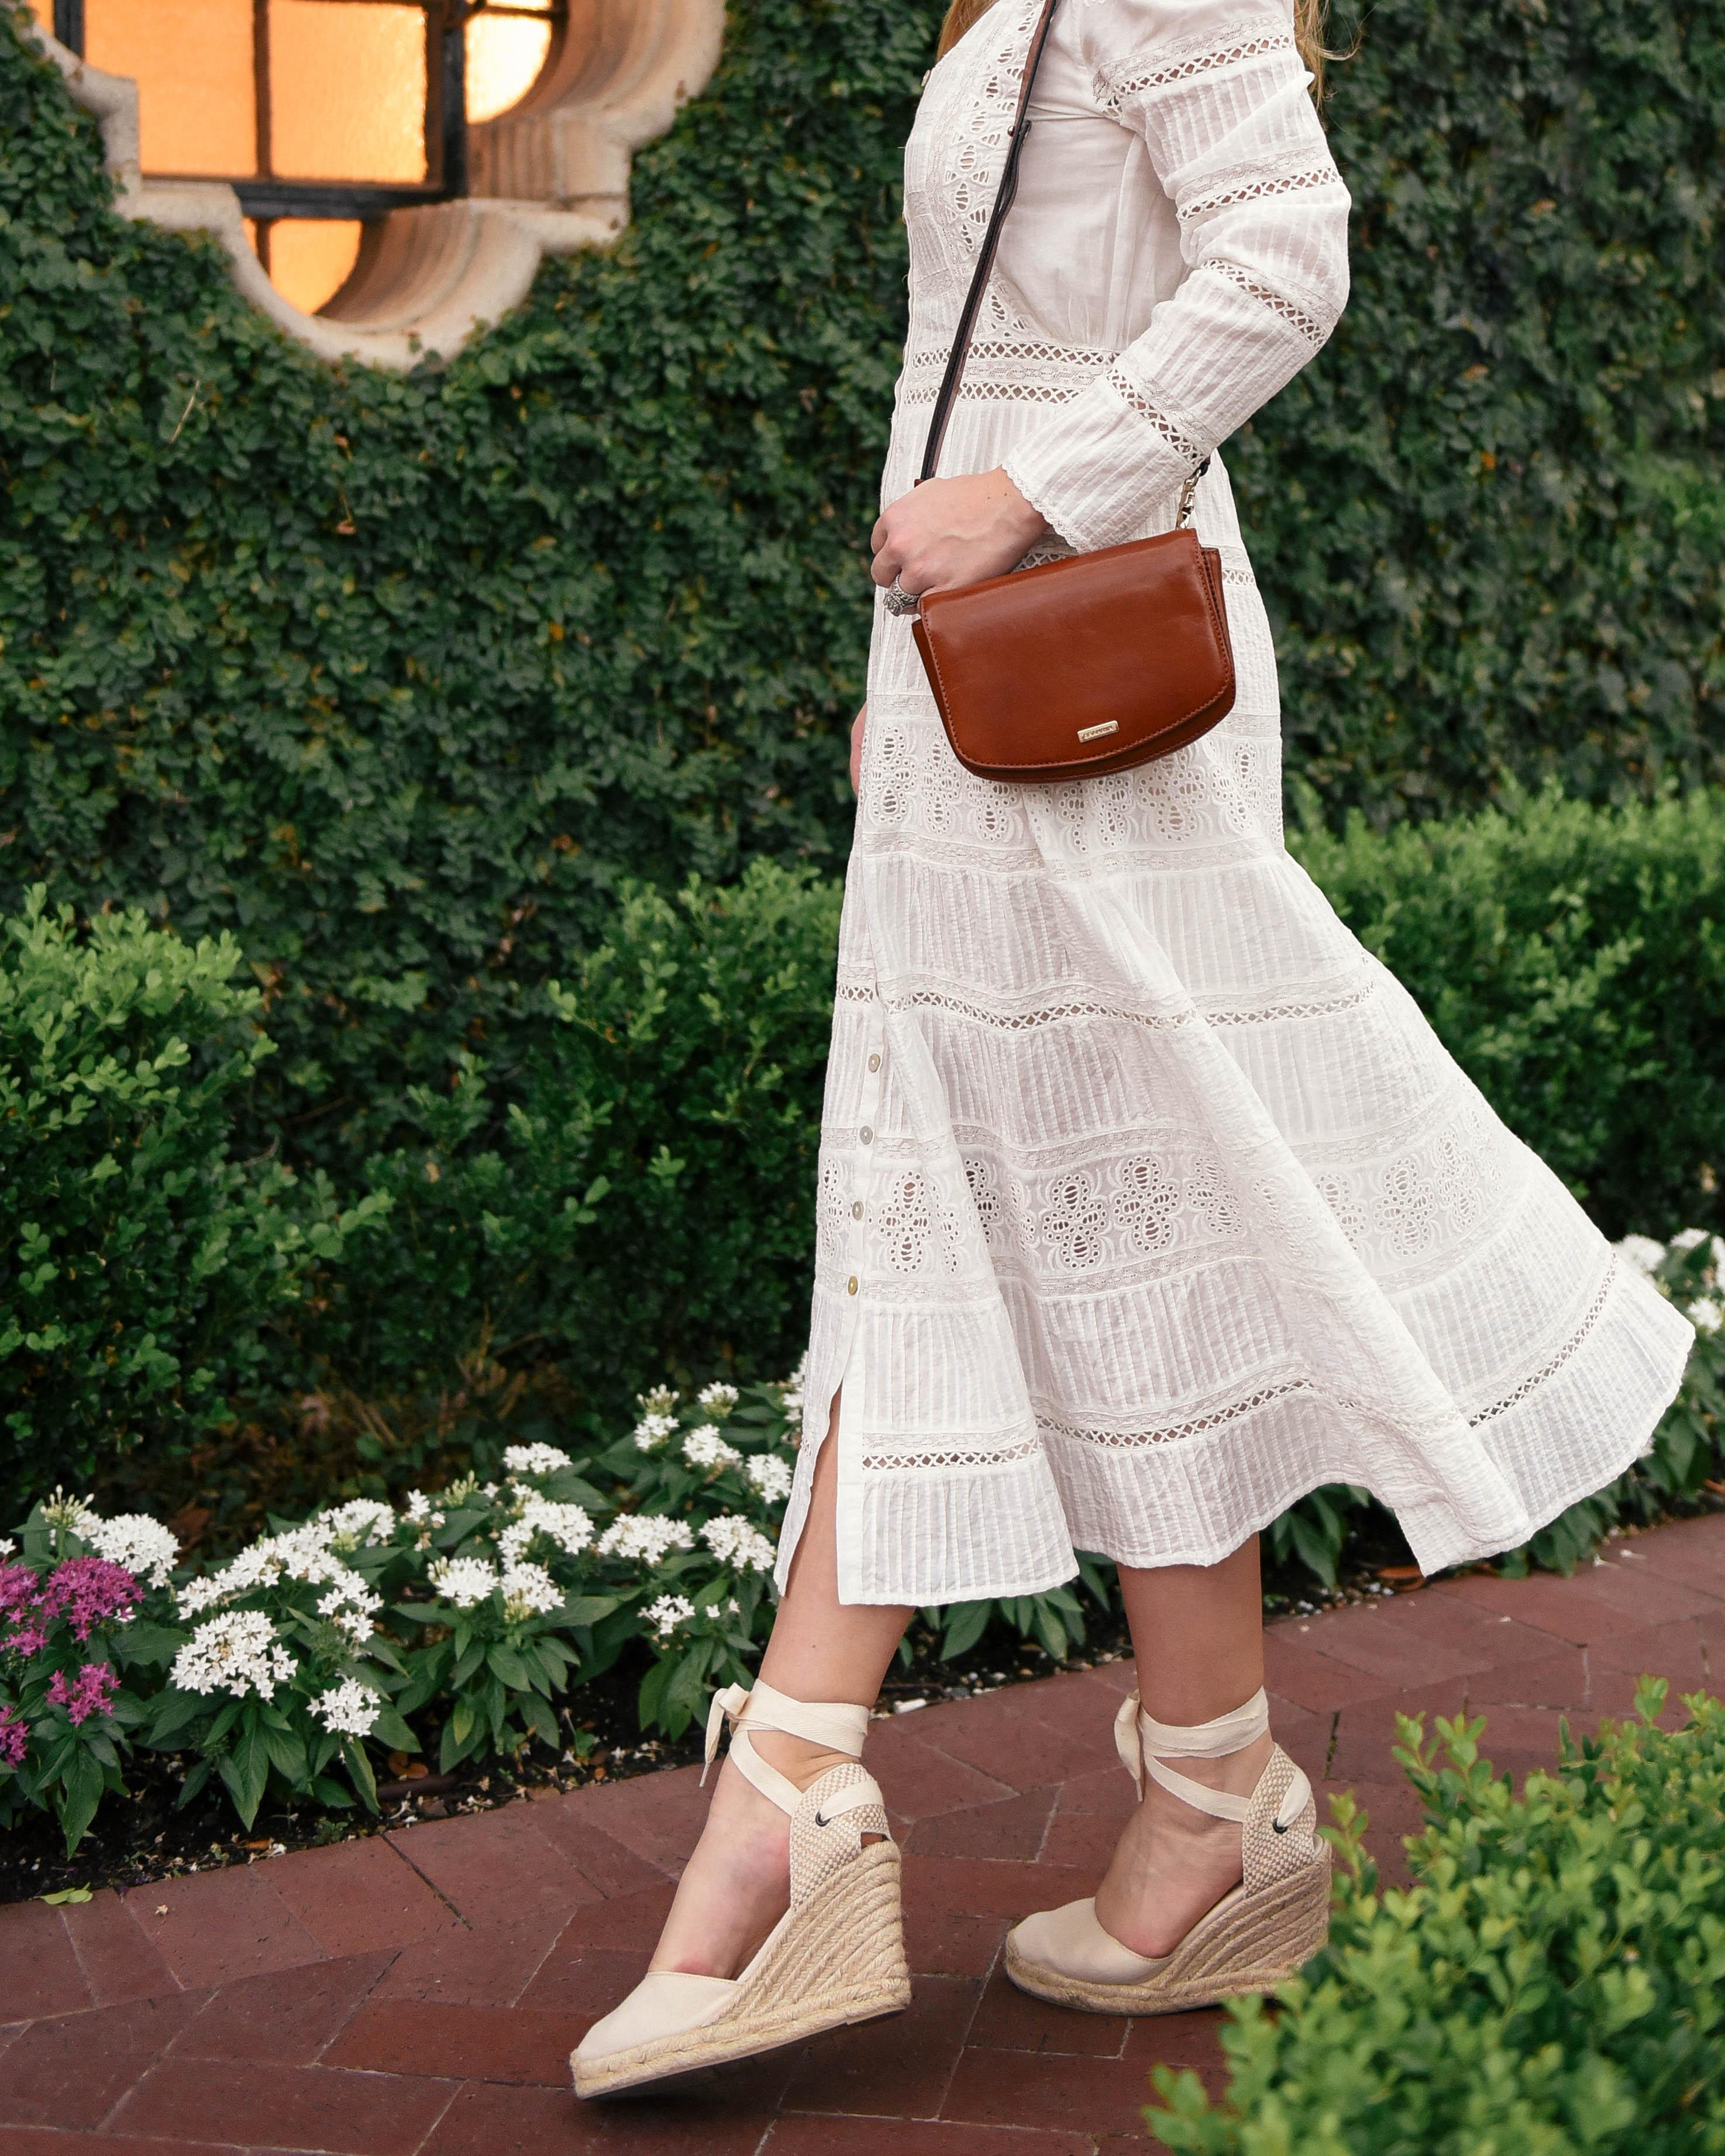 Brahmin-Handbag-Leather-Bag-Designer-Handbag-Crossbody-Bag-Lil-Topsail-Belt-Bag-Dallas-Blogger-Lo-Murphy